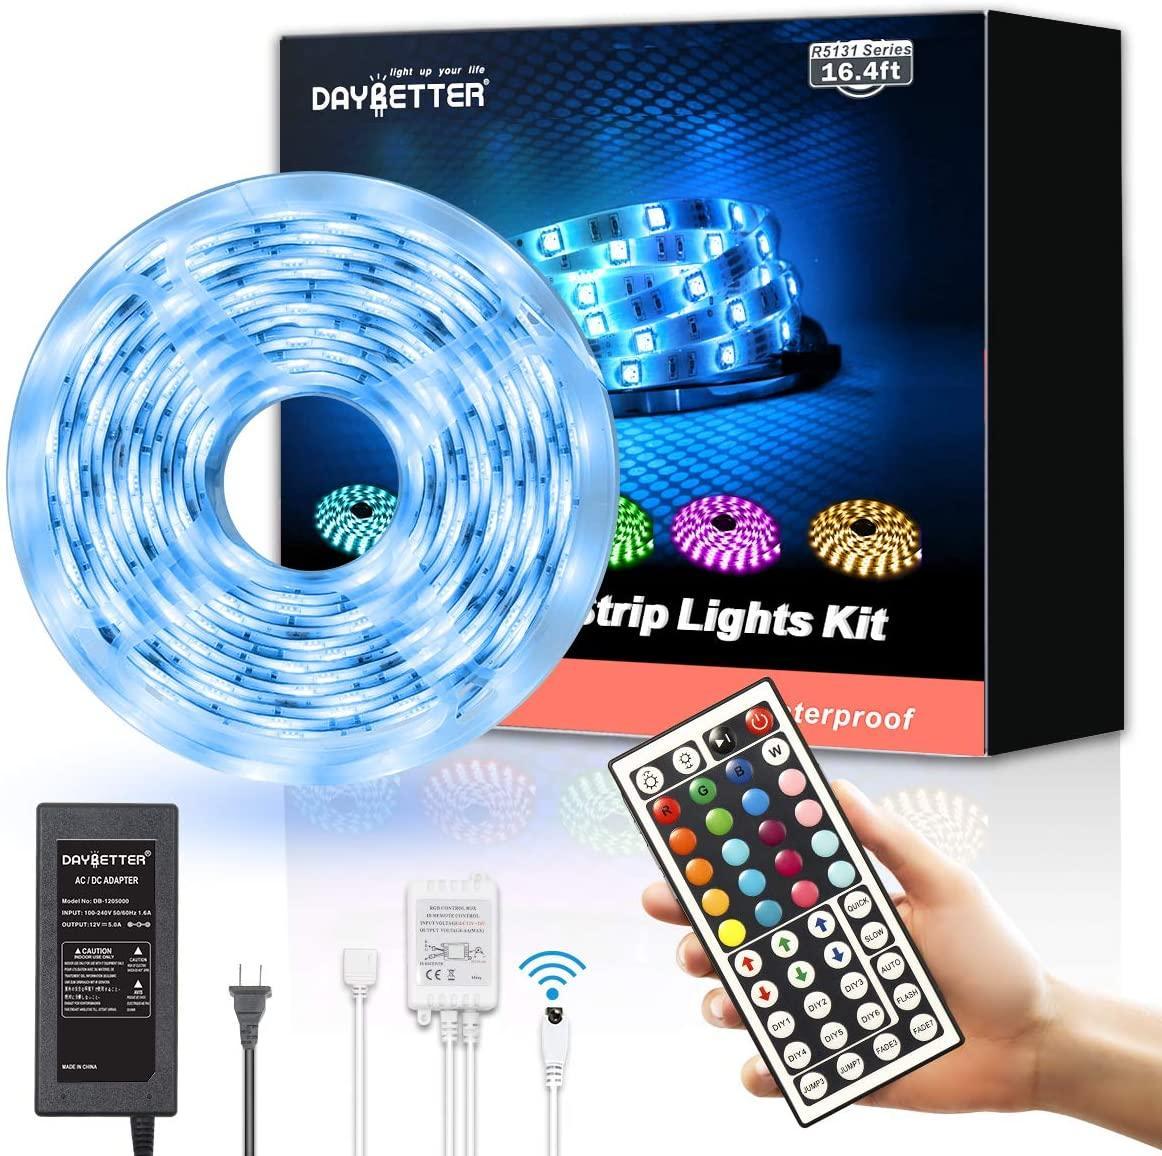 Dekorasyon LED Şerit Işıkları RGB 16.4ft / 5 M SMD 5050 DC12V Esnek Les Şeritler Işıklar 50LED / Metre 16 Sonfferent Statik Renkler